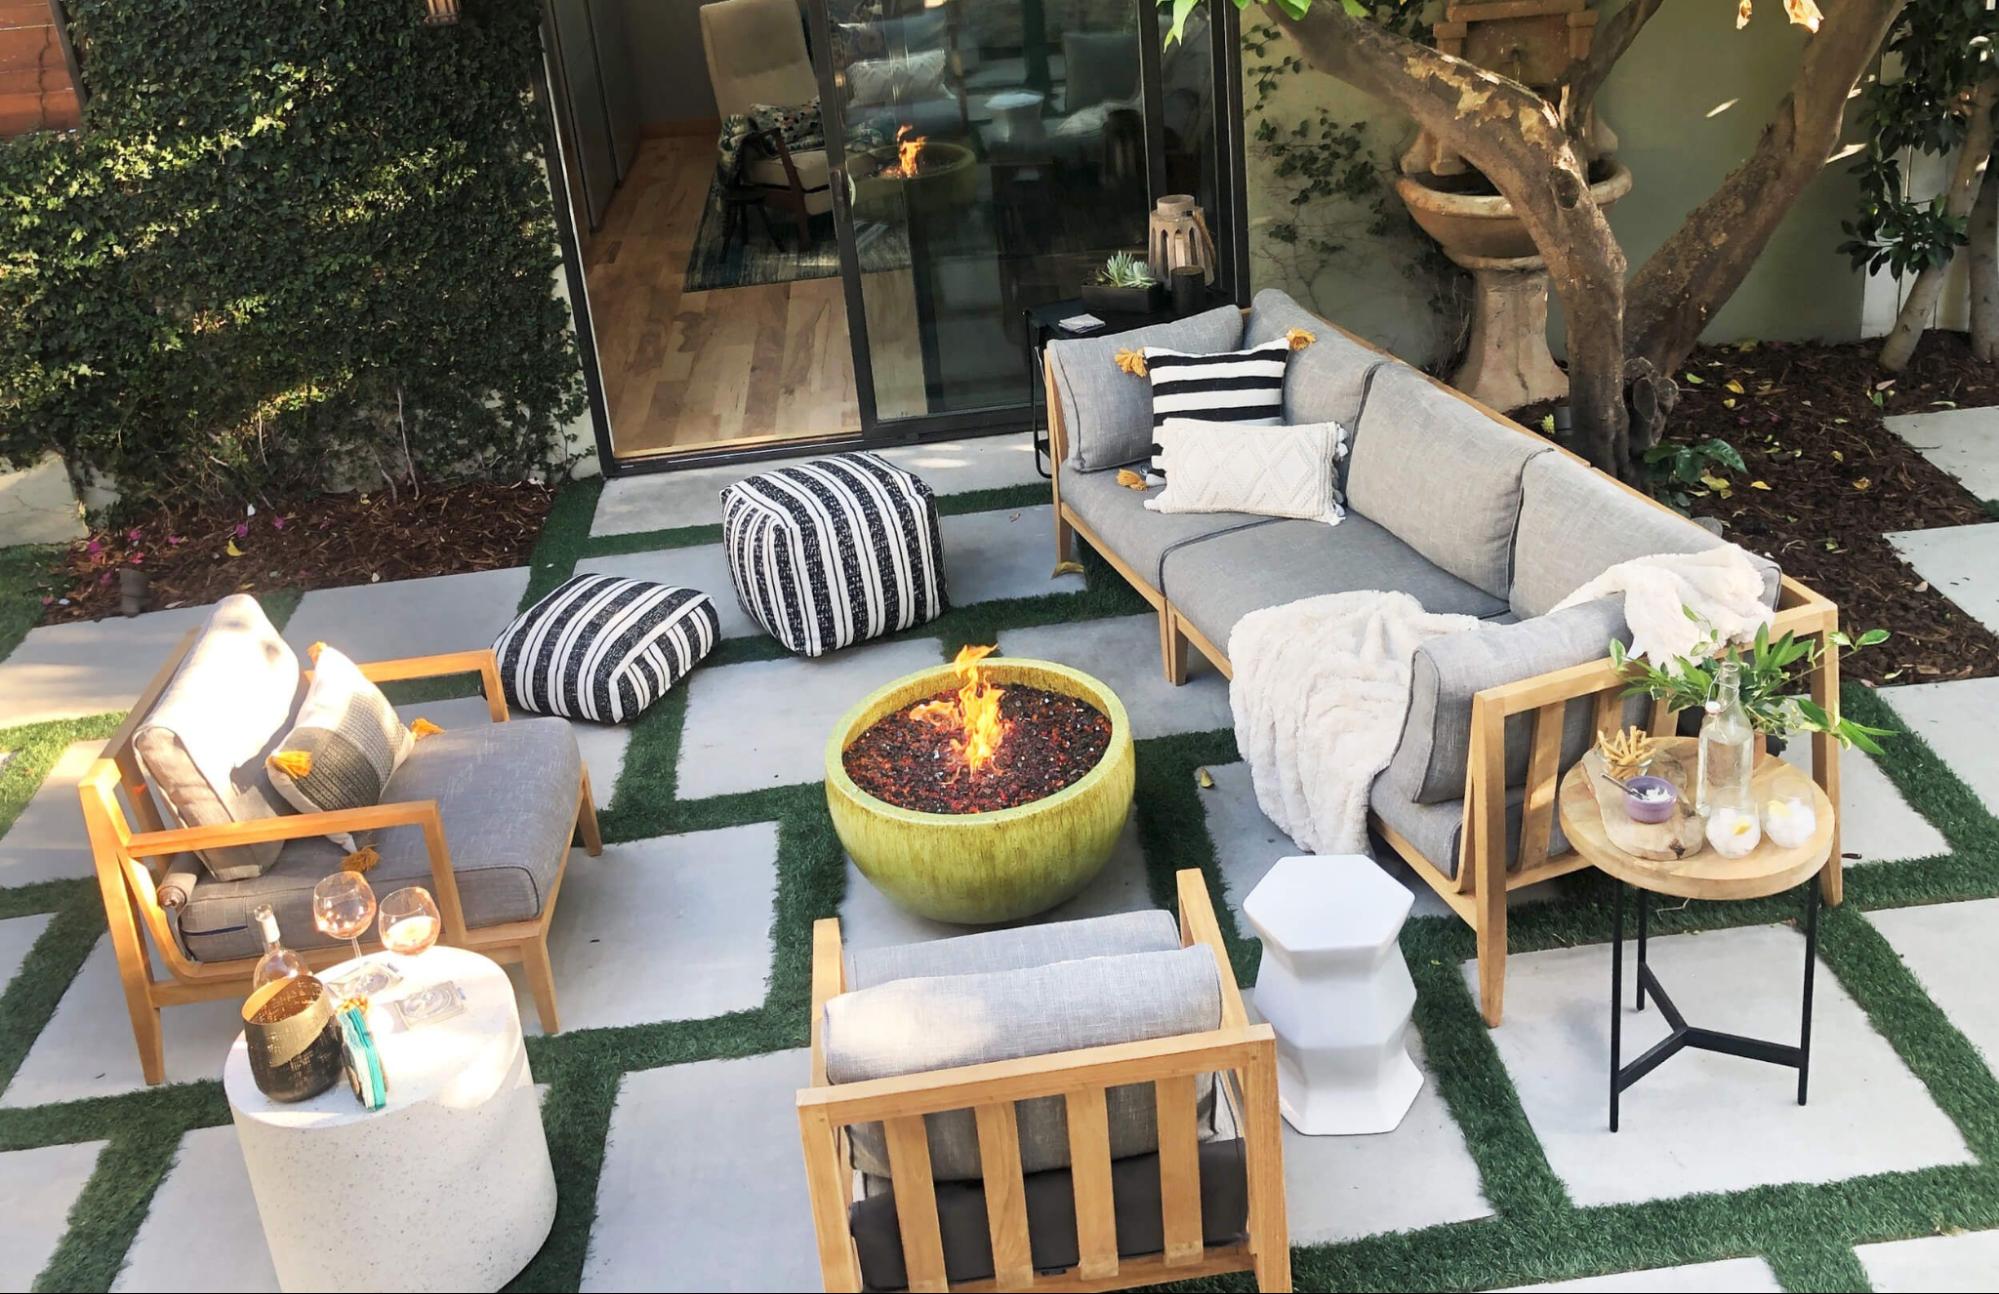 Teak outdoor furniture surrounding a fire pit